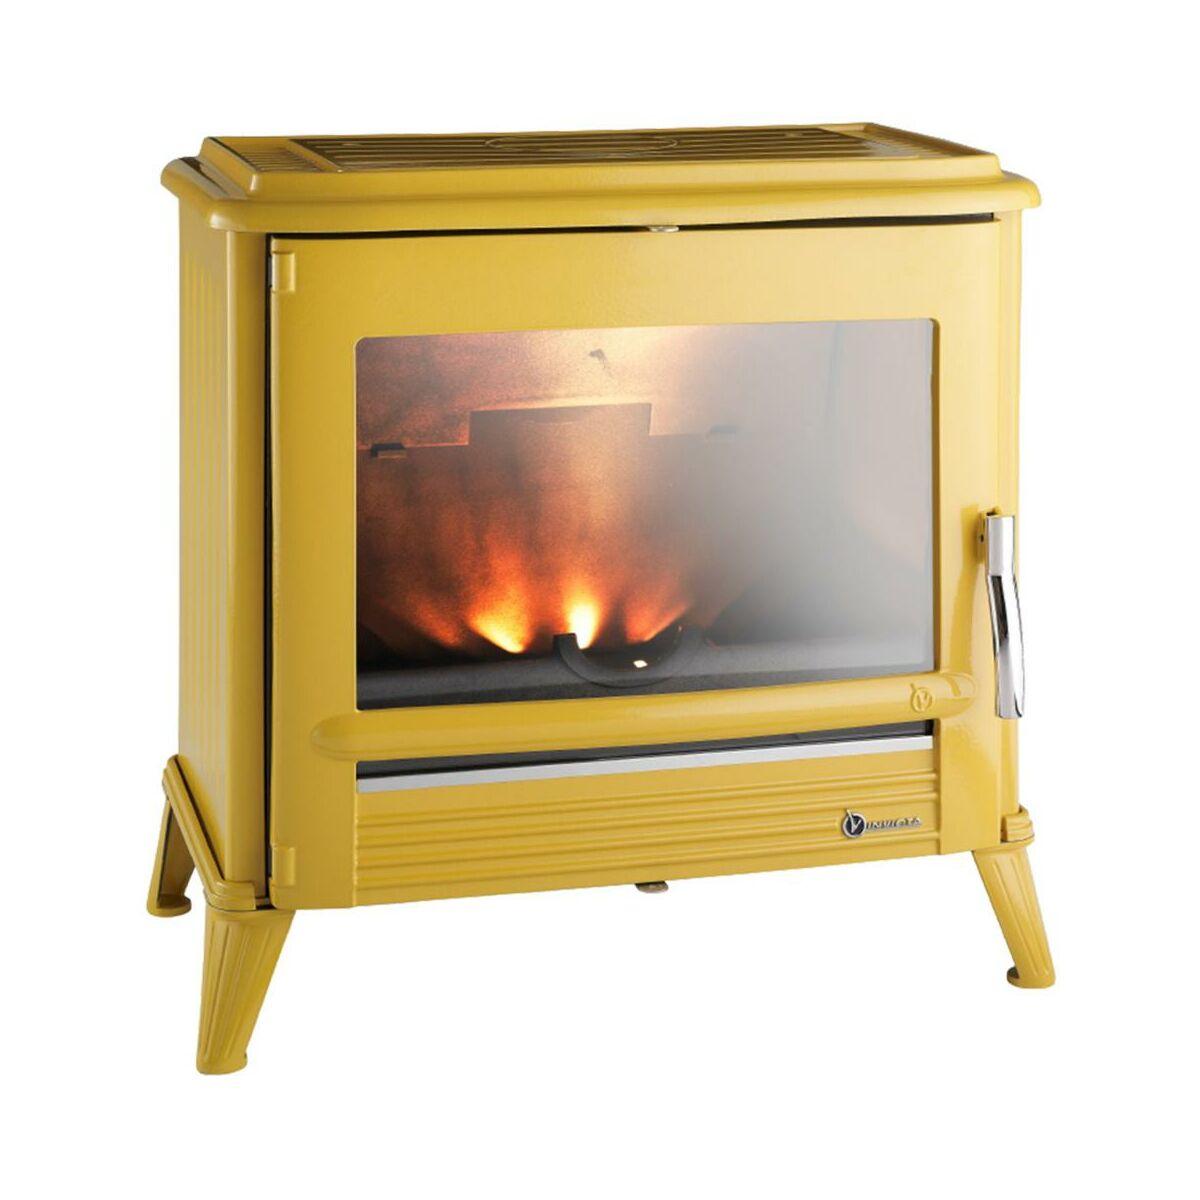 piec kominkowy modena jaune ty invicta piece. Black Bedroom Furniture Sets. Home Design Ideas